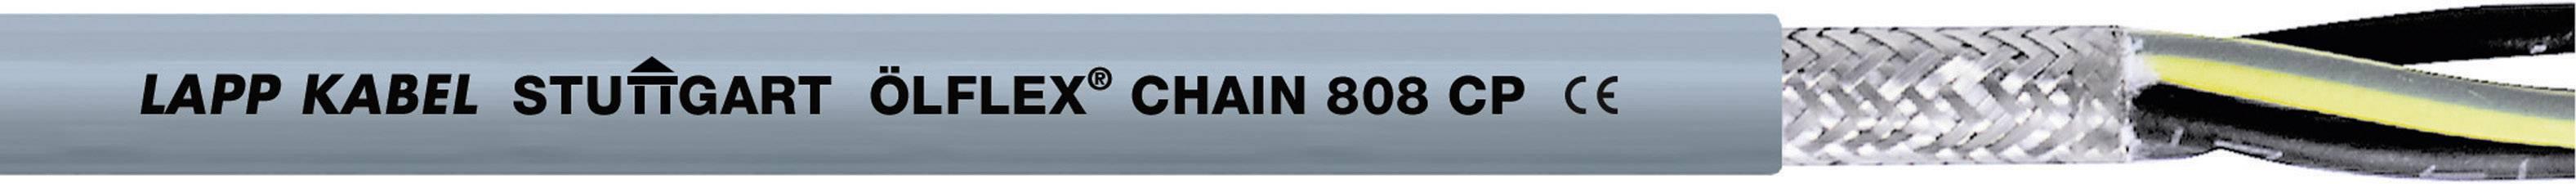 Žíla kabelu LappKabel ÖLFLEX CHAIN 808 CP 4G2,5 (1027784), 4x 2,5 mm², polyurethan, Ø 10,1 mm, stíněný, 50 m,